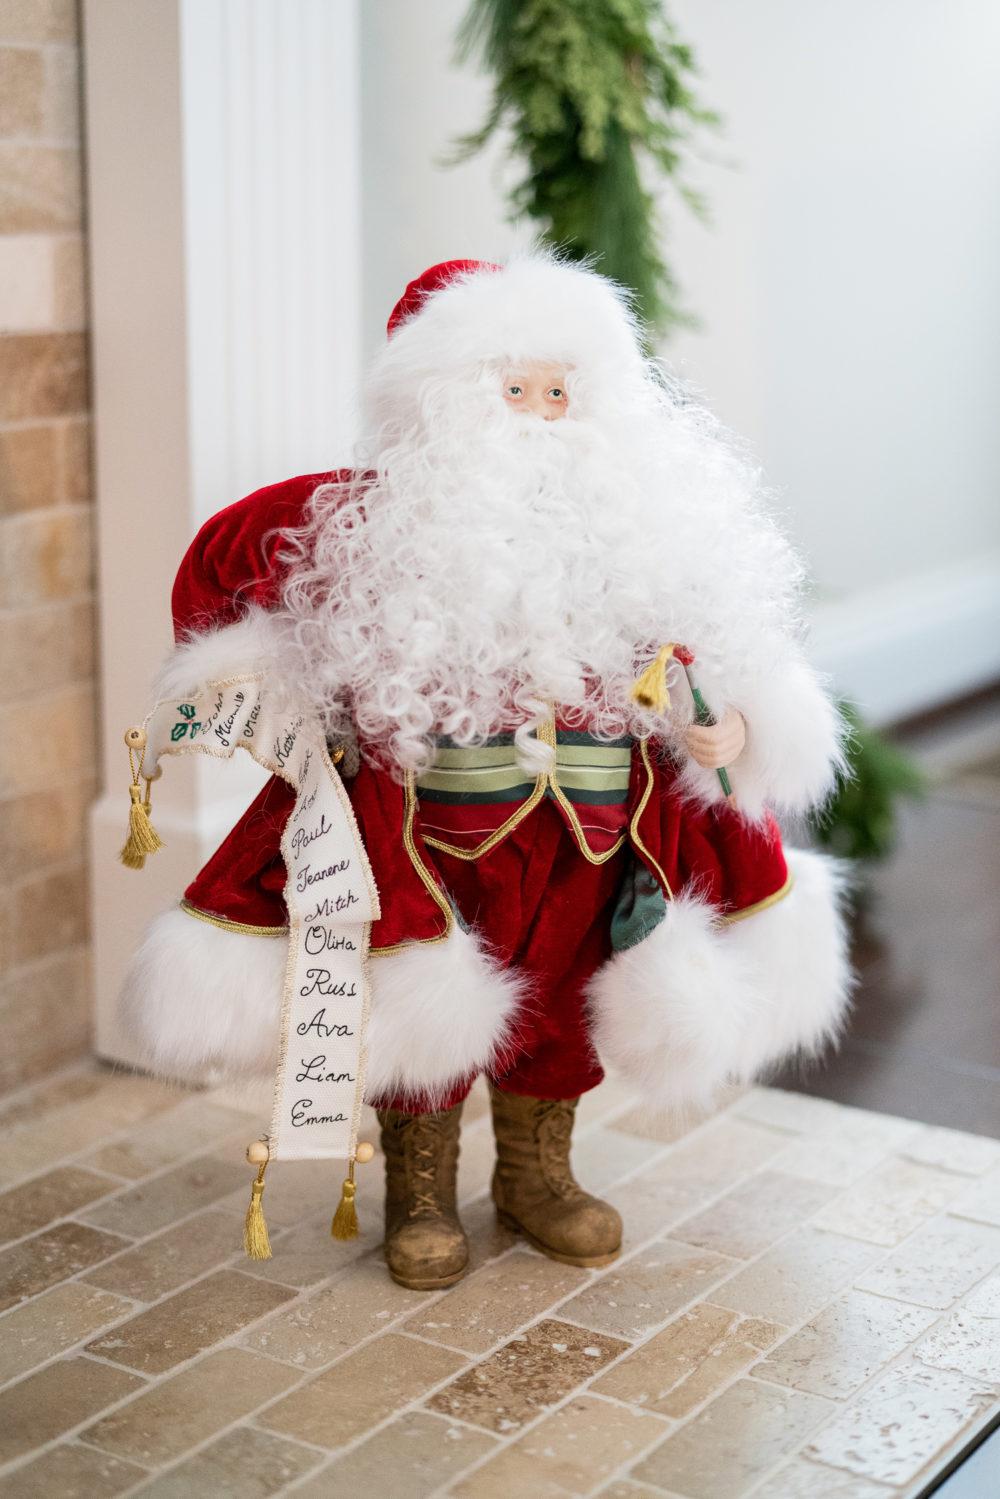 Petite Fashion Blog | Our Home for the Holidays | Christmas Decor | Flocked Christmas Tree | Santa Statue